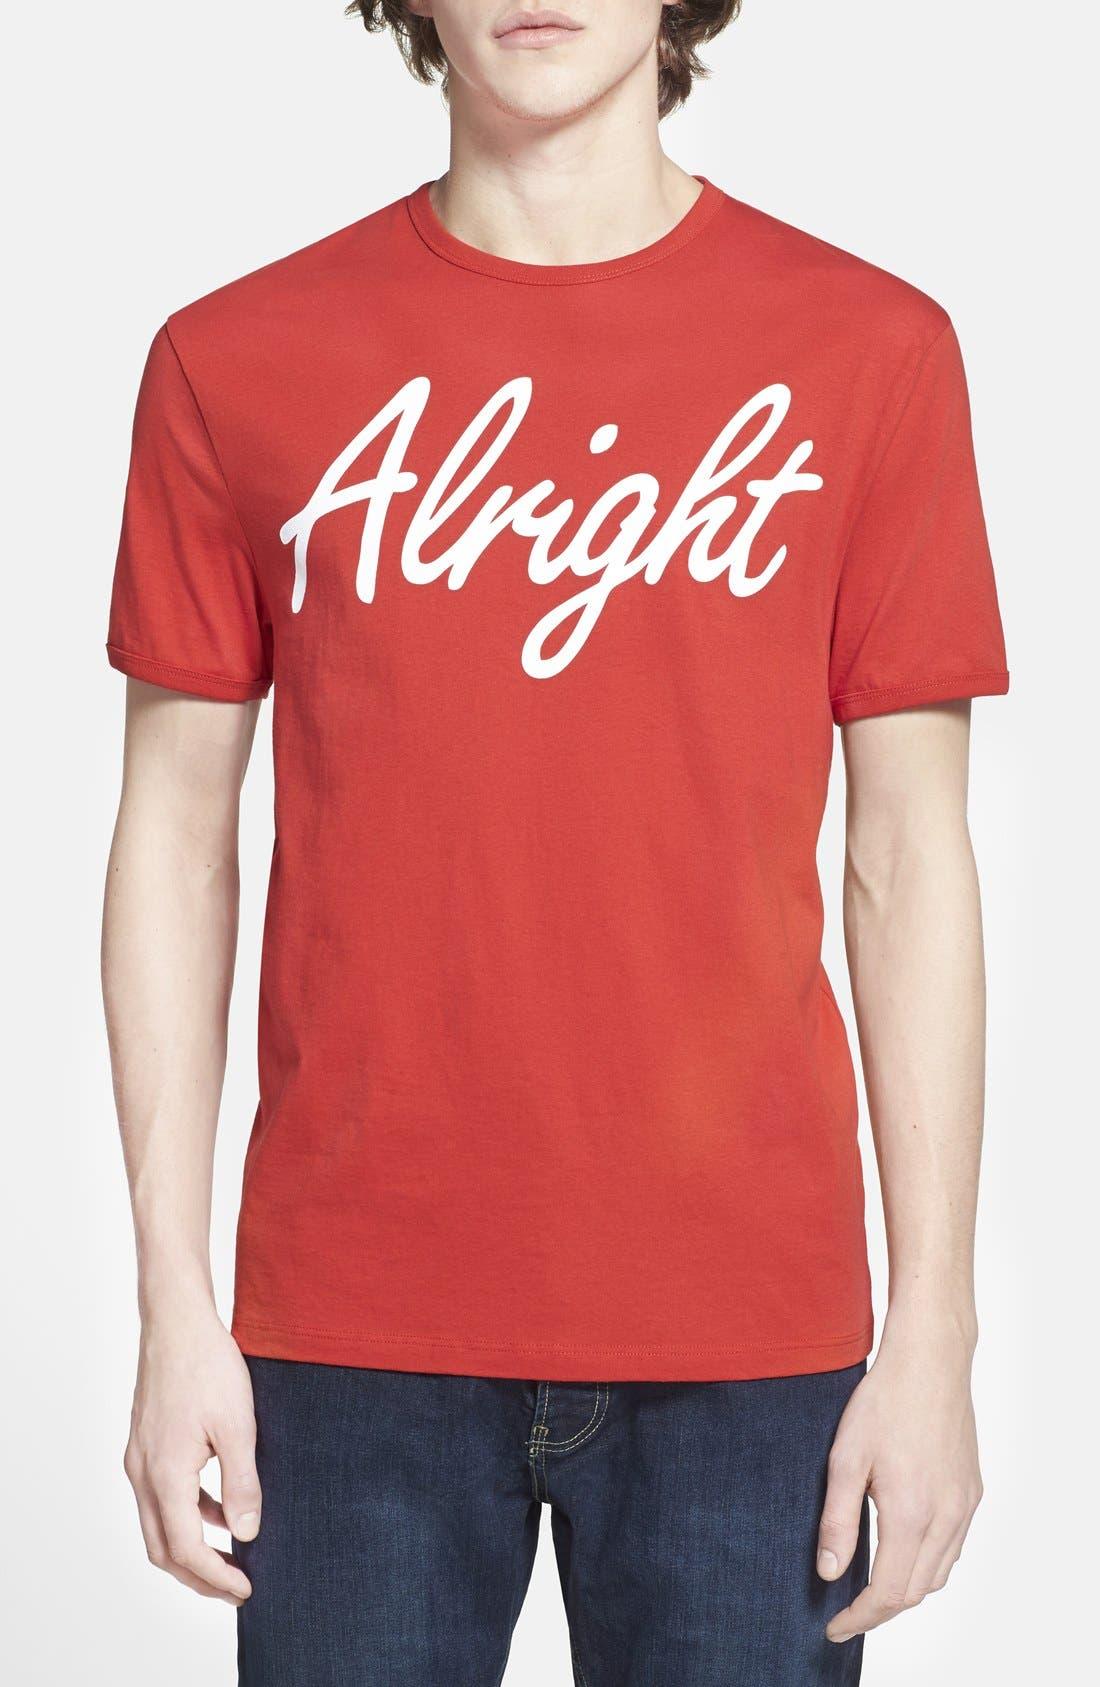 Alternate Image 1 Selected - Topman 'Alright' Jersey T-Shirt (Brit Pop-In) (Nordstrom Exclusive)